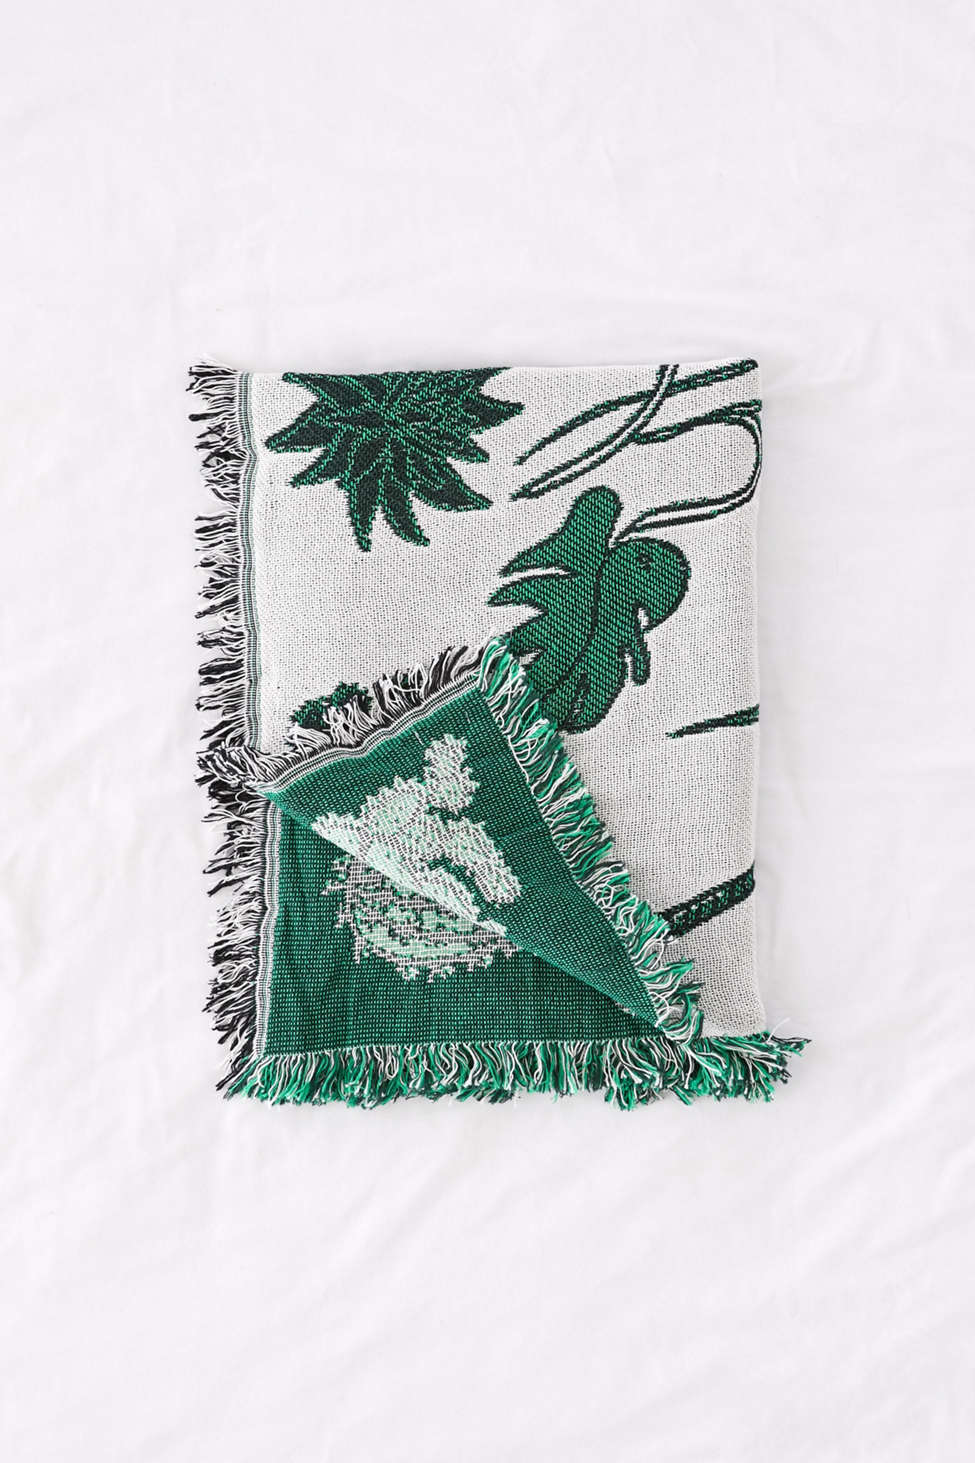 Slide View: 3: Calhoun & Co. Plants! Throw Blanket